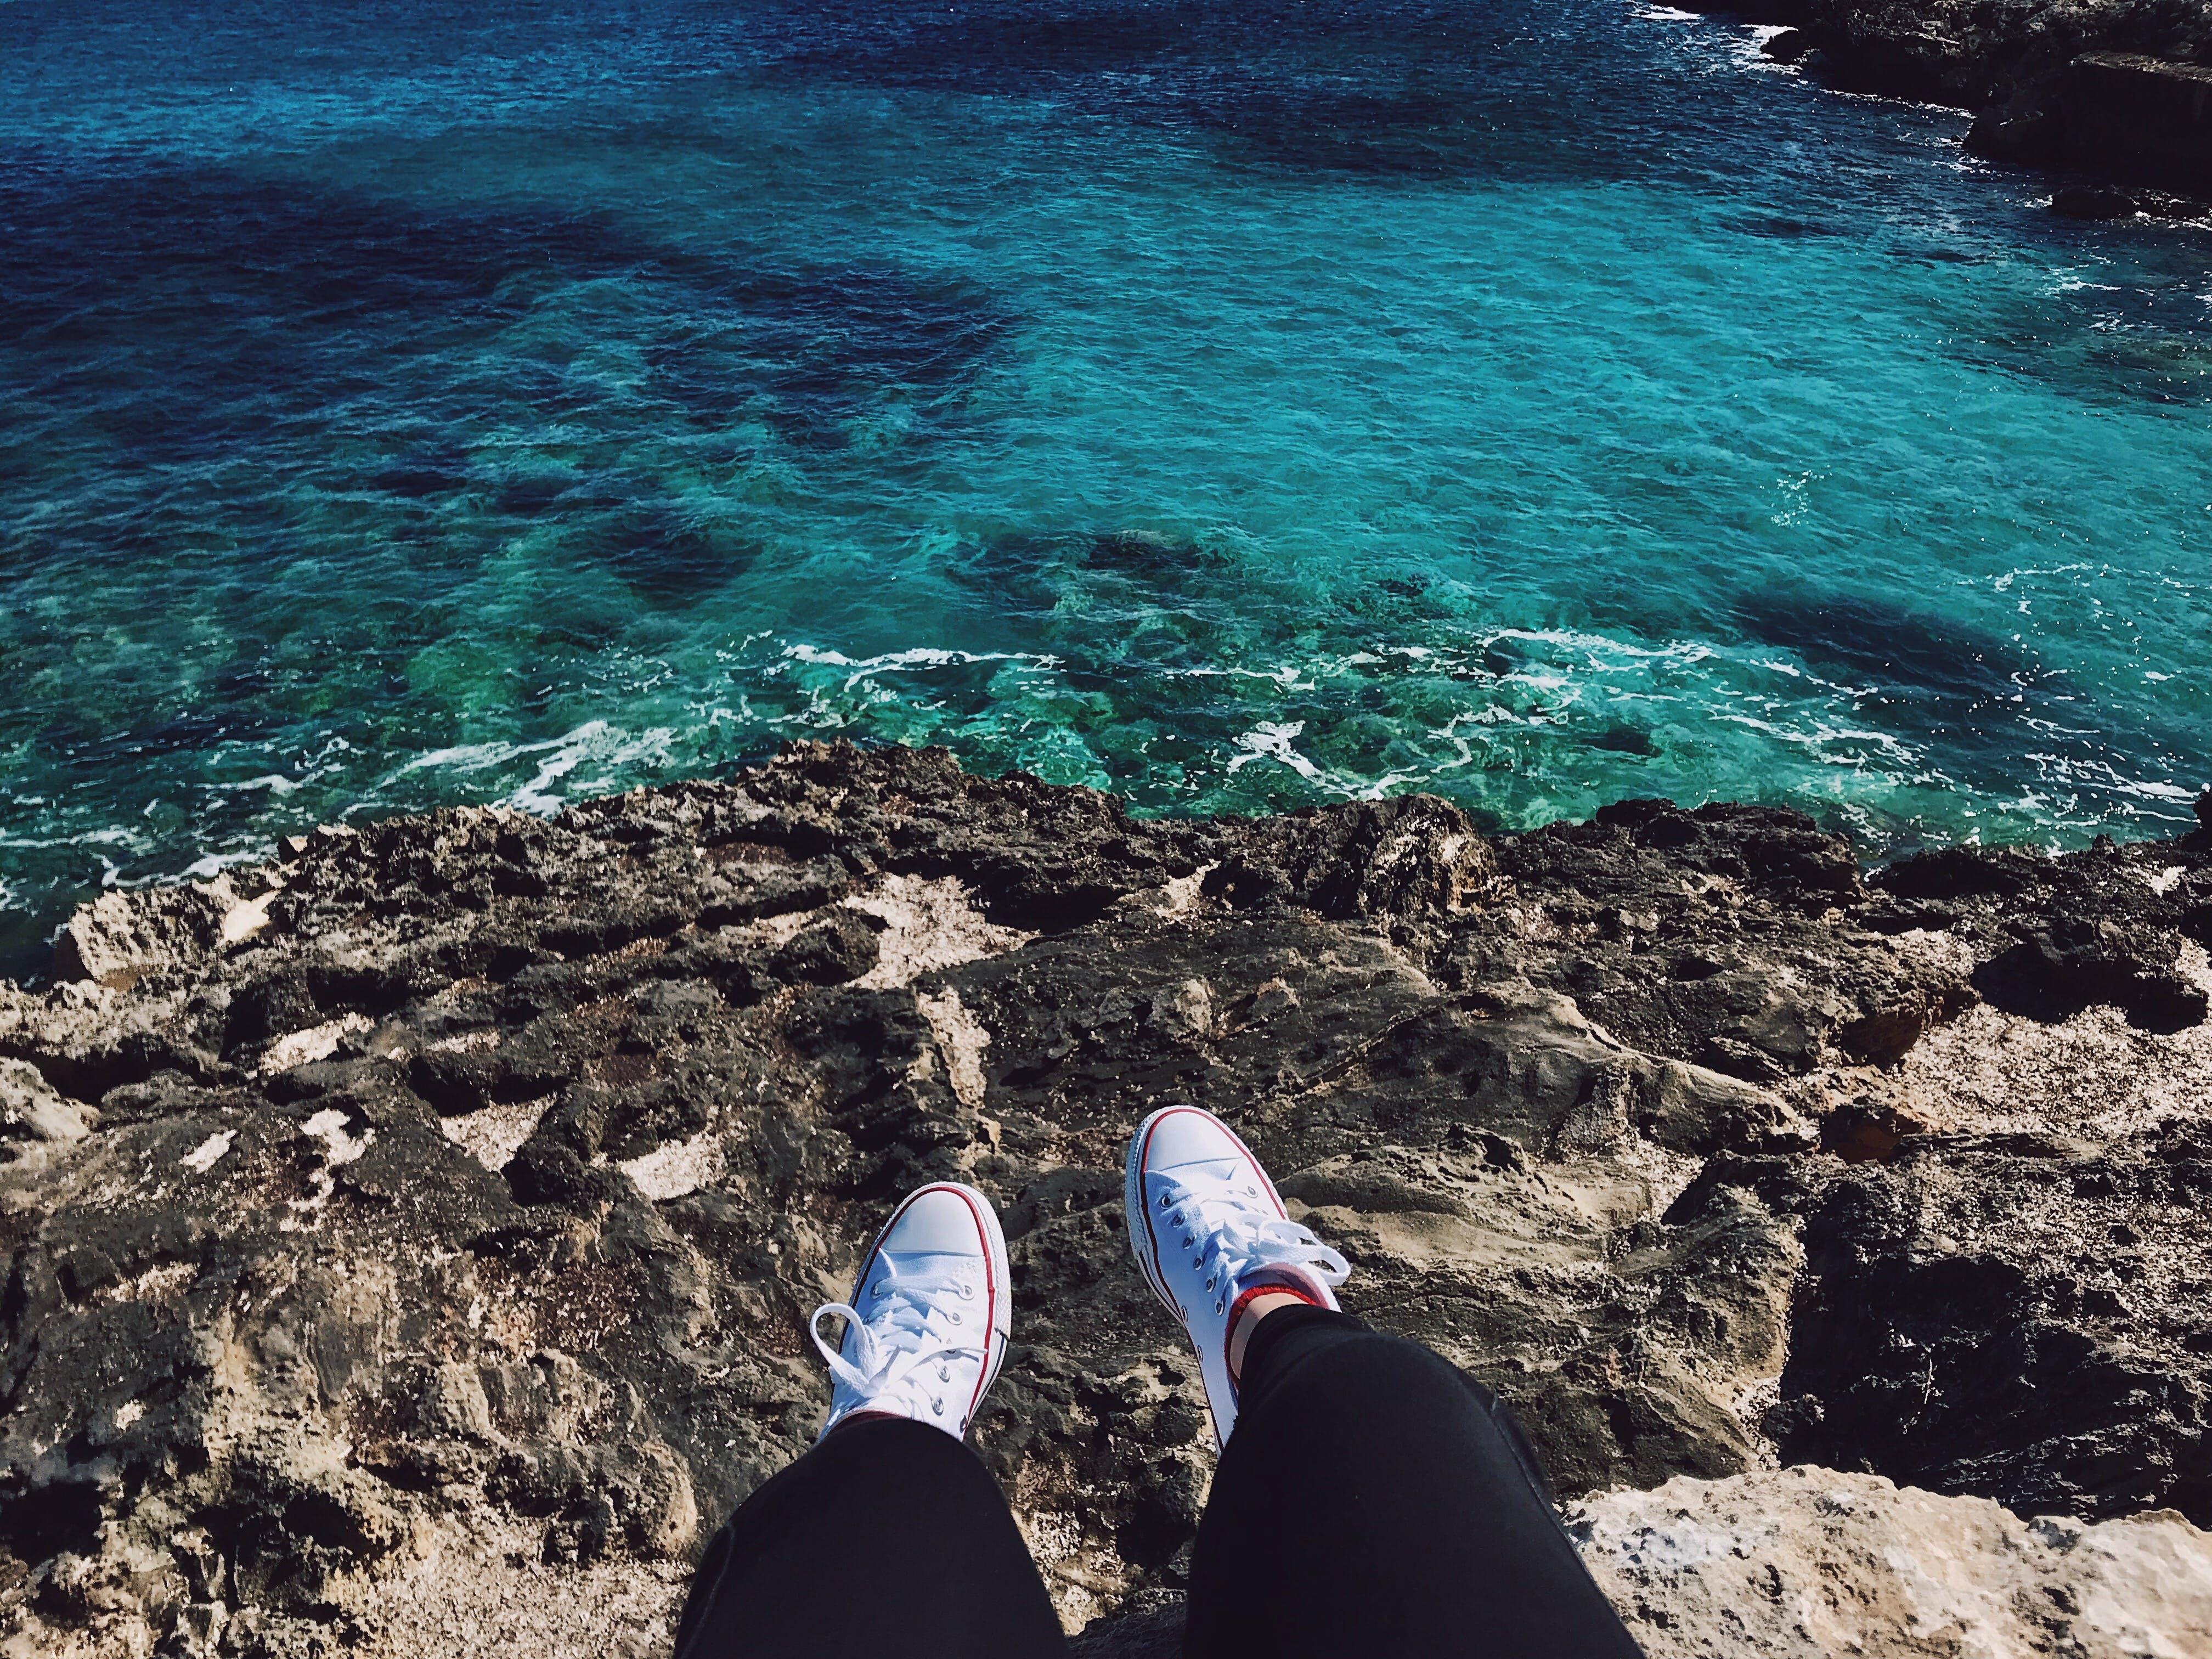 Gratis lagerfoto af Converse, dybt hav, klippe